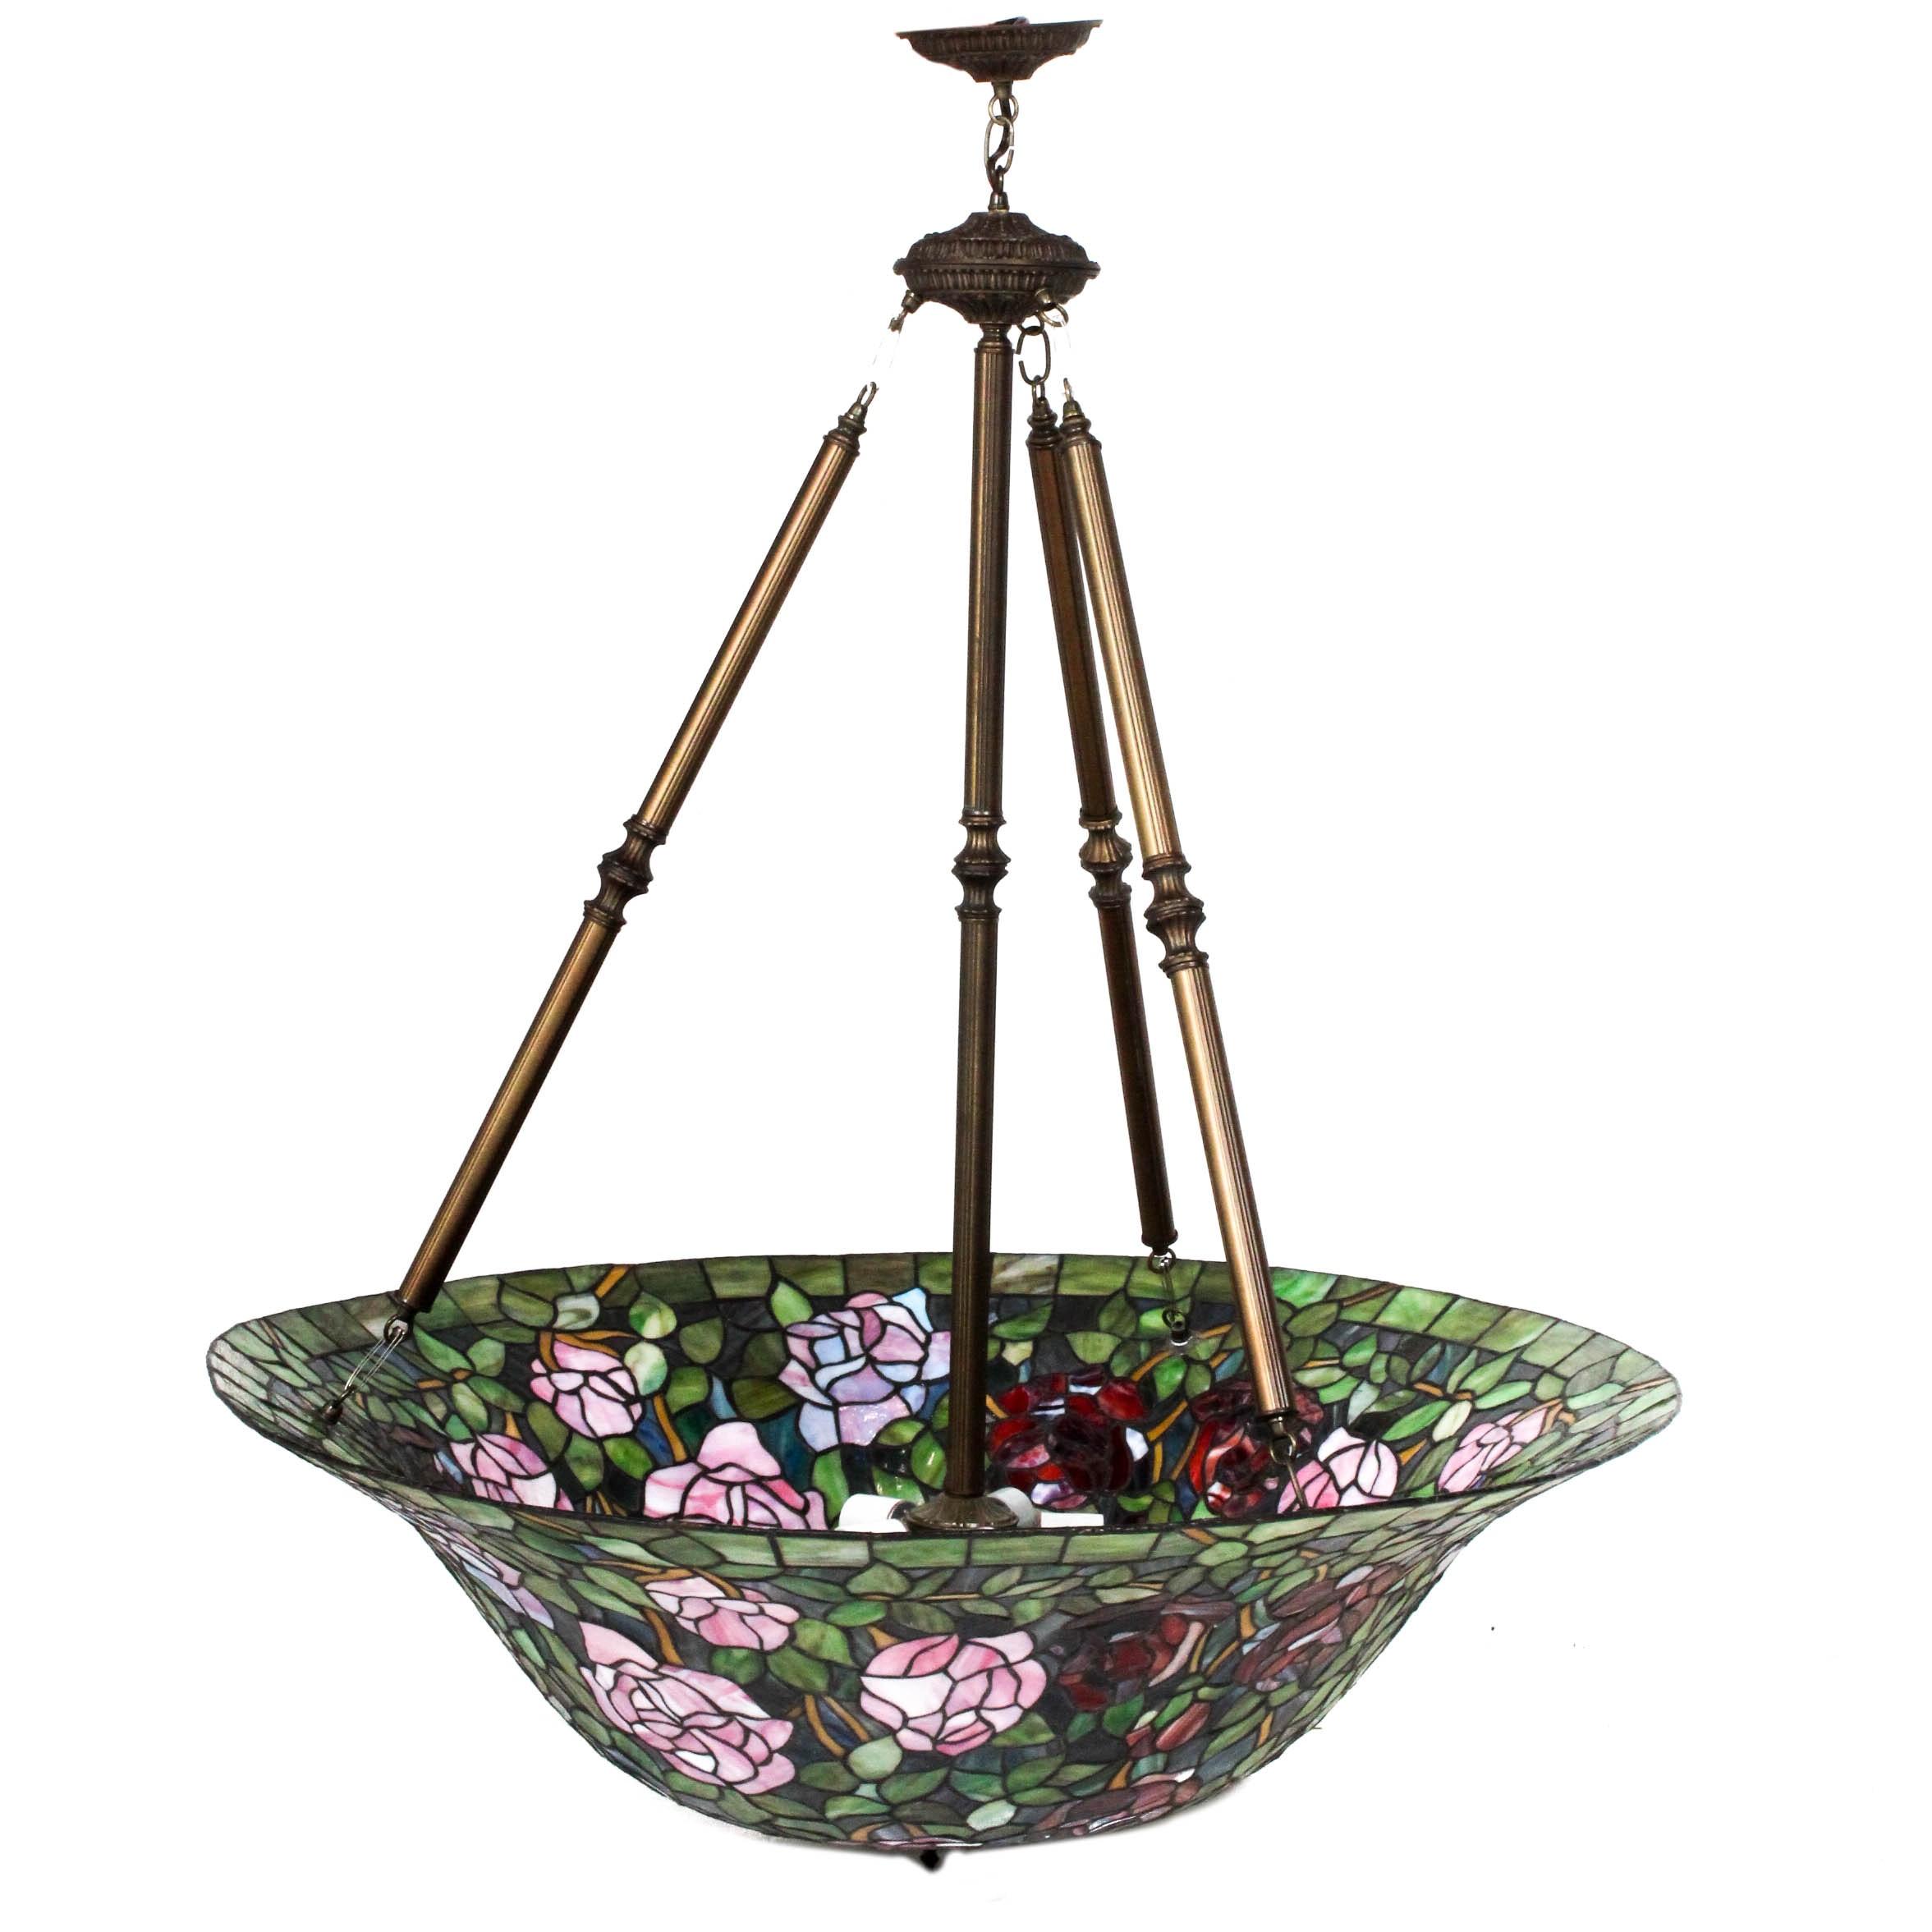 Loevsky & Loevsky WMC Slag Glass Pendant Lamp